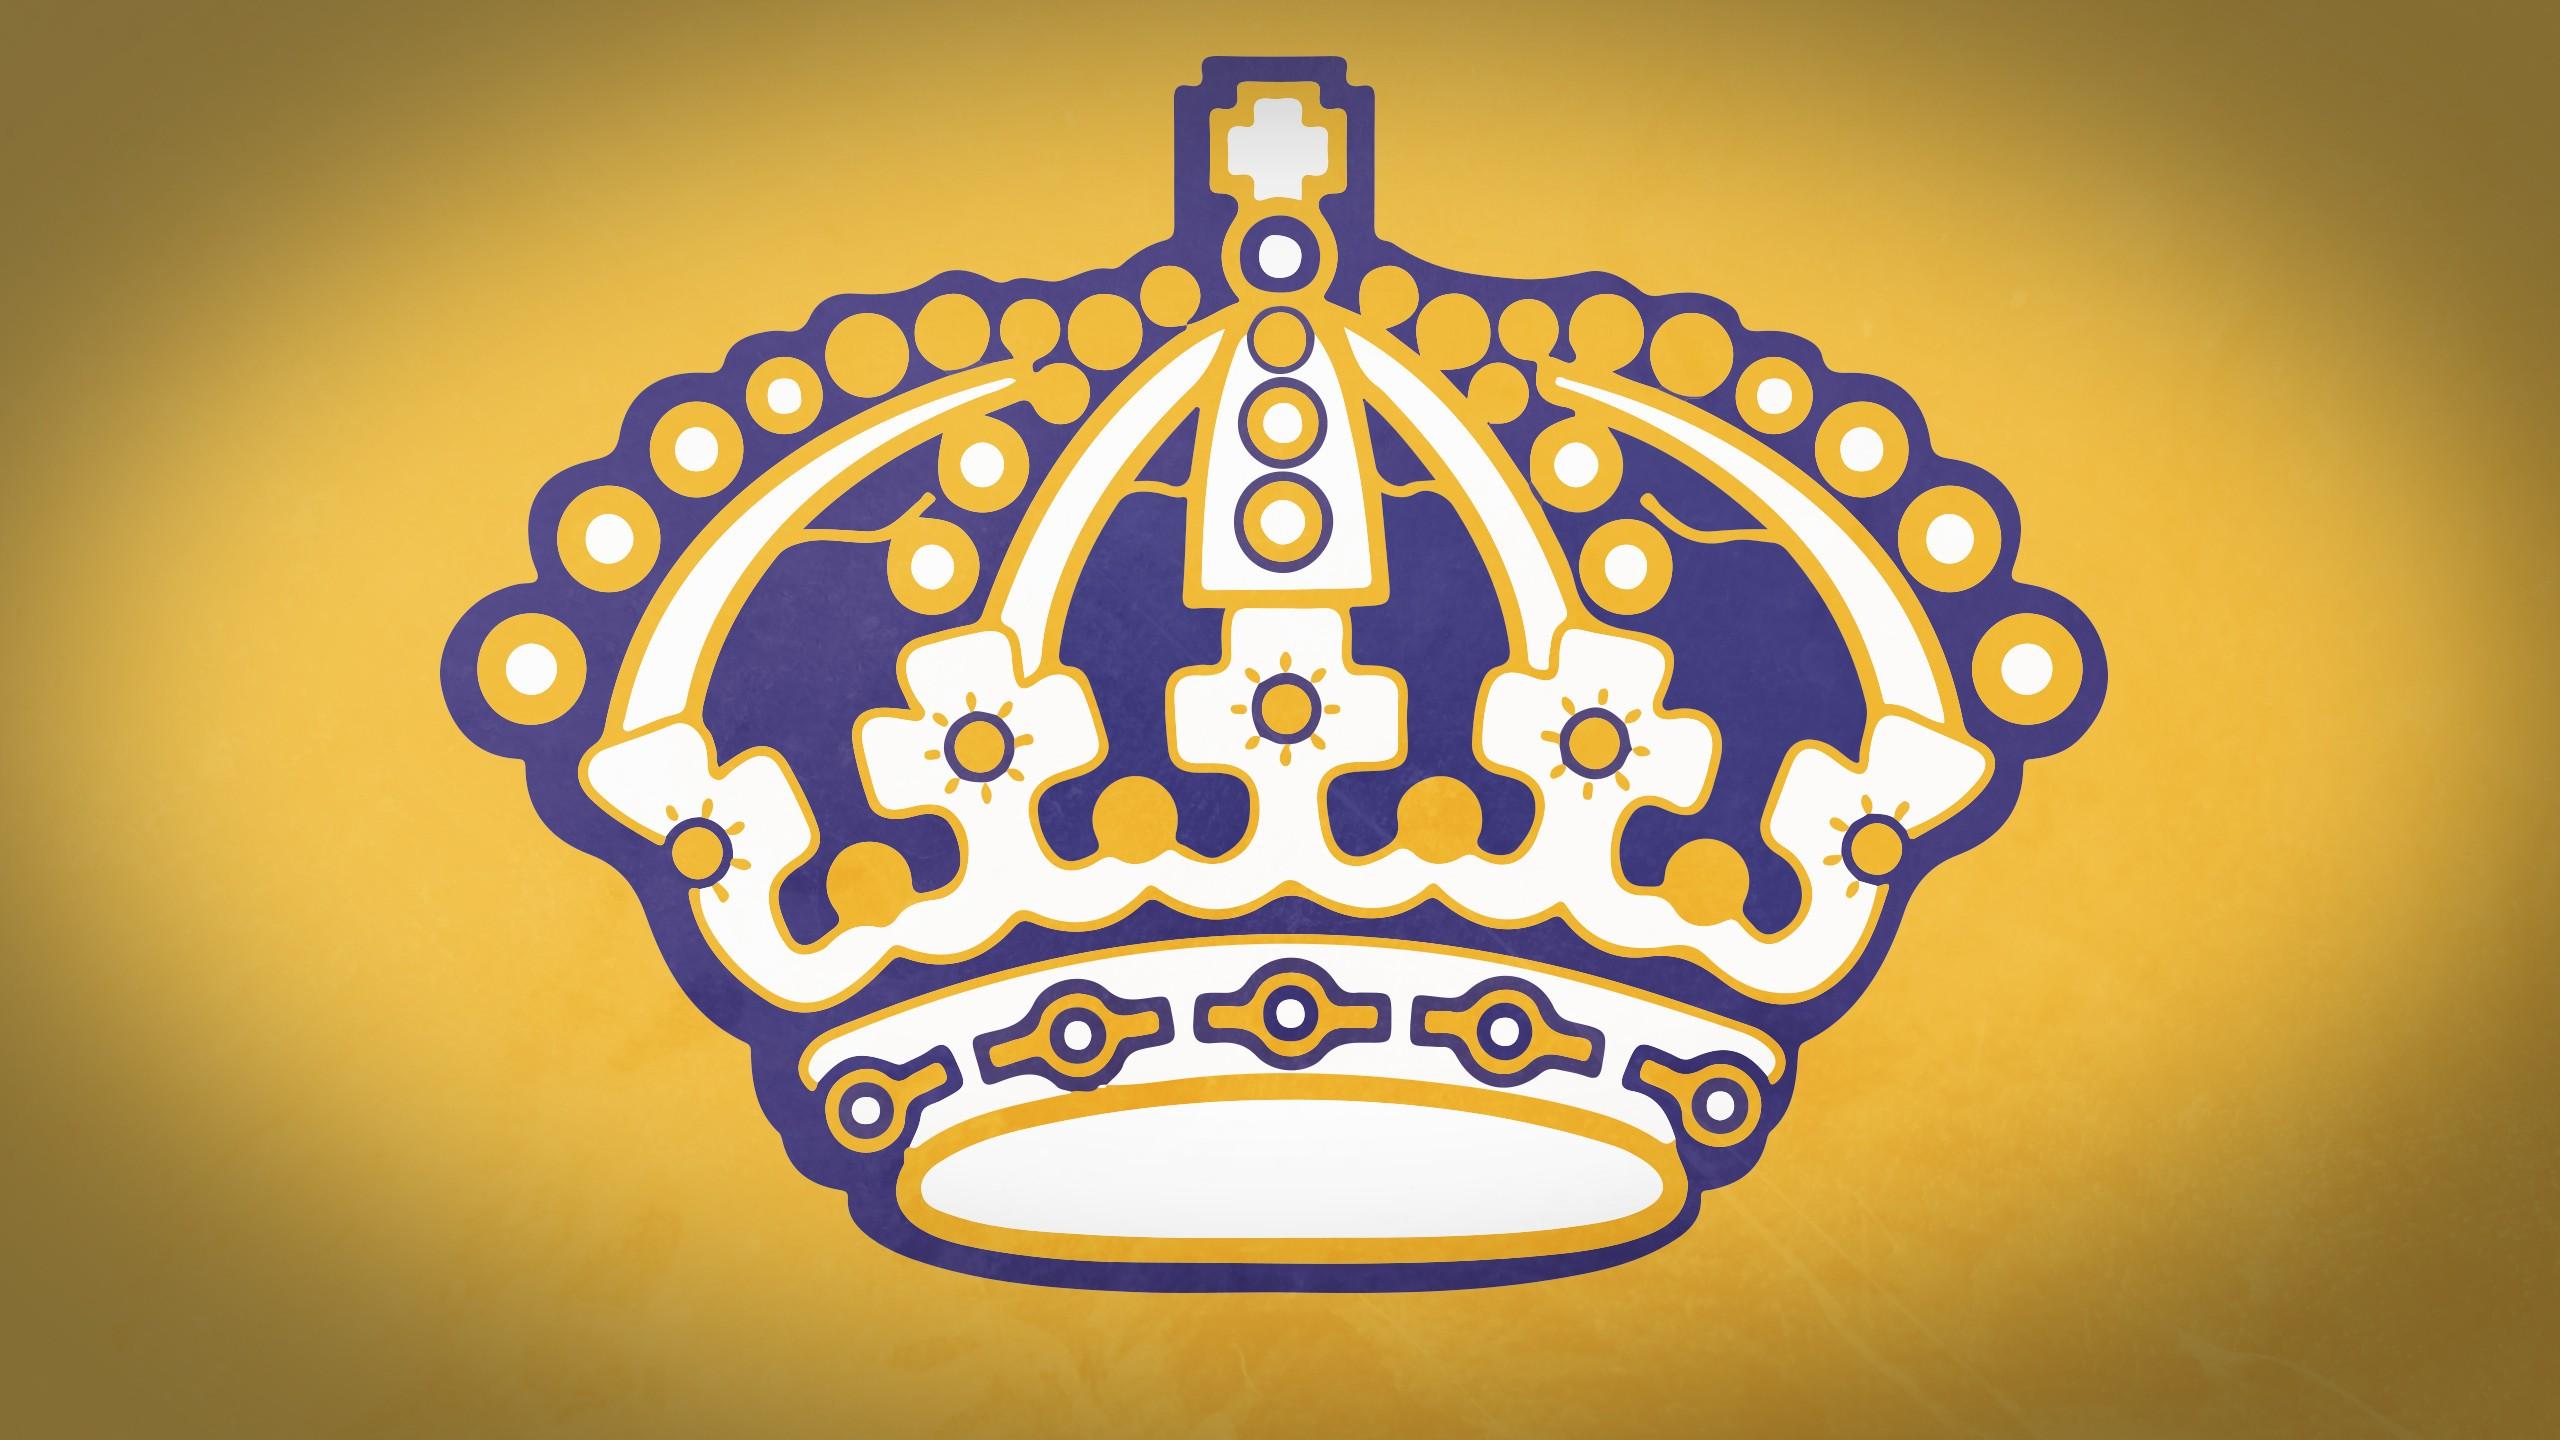 Los angeles kings full hd wallpaper and background image 2560x1440 sports los angeles kings wallpaper voltagebd Choice Image